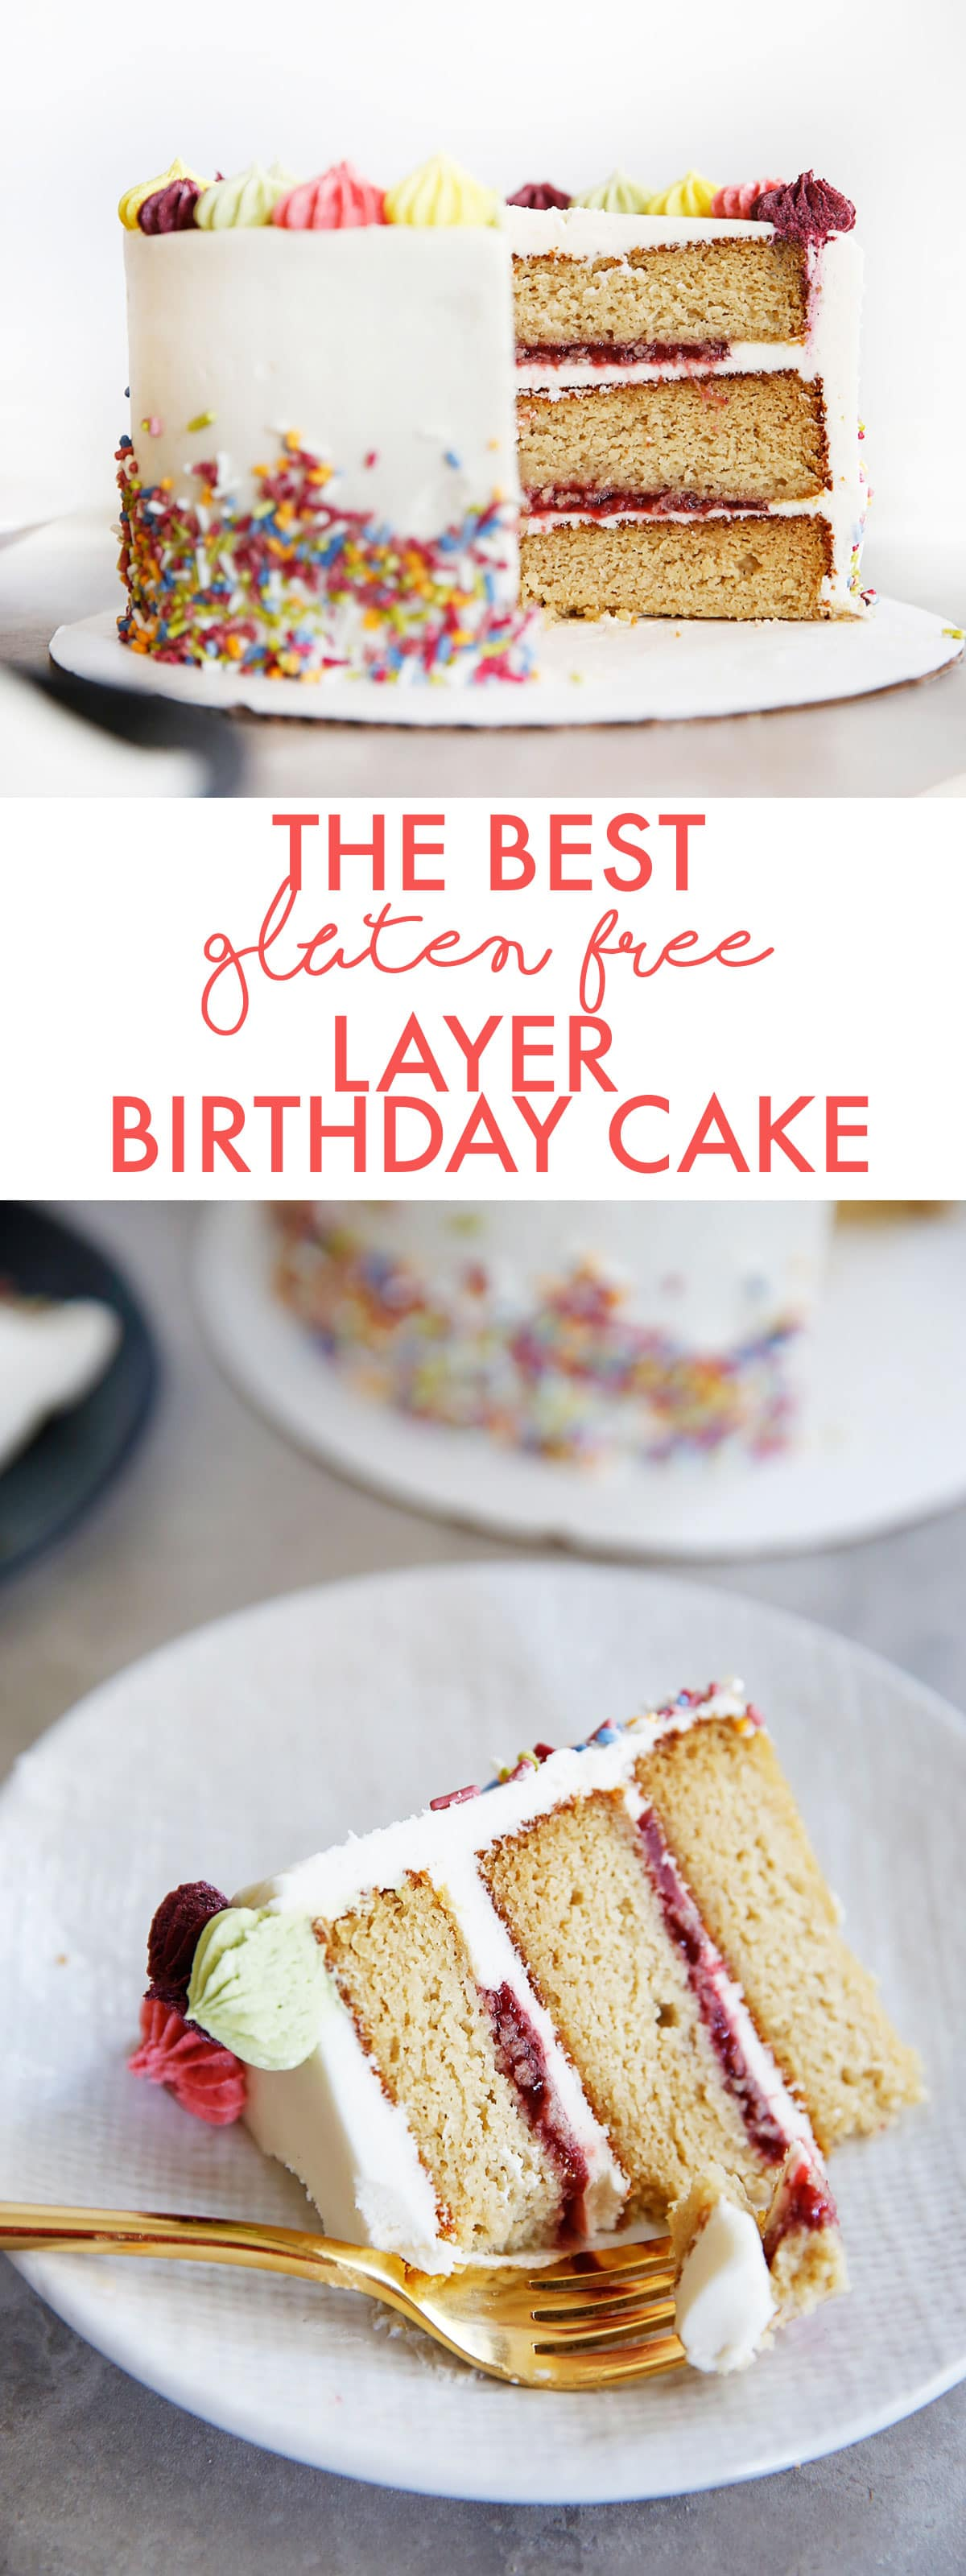 The Best Gluten Free Layer Birthday Cake Lexi S Clean